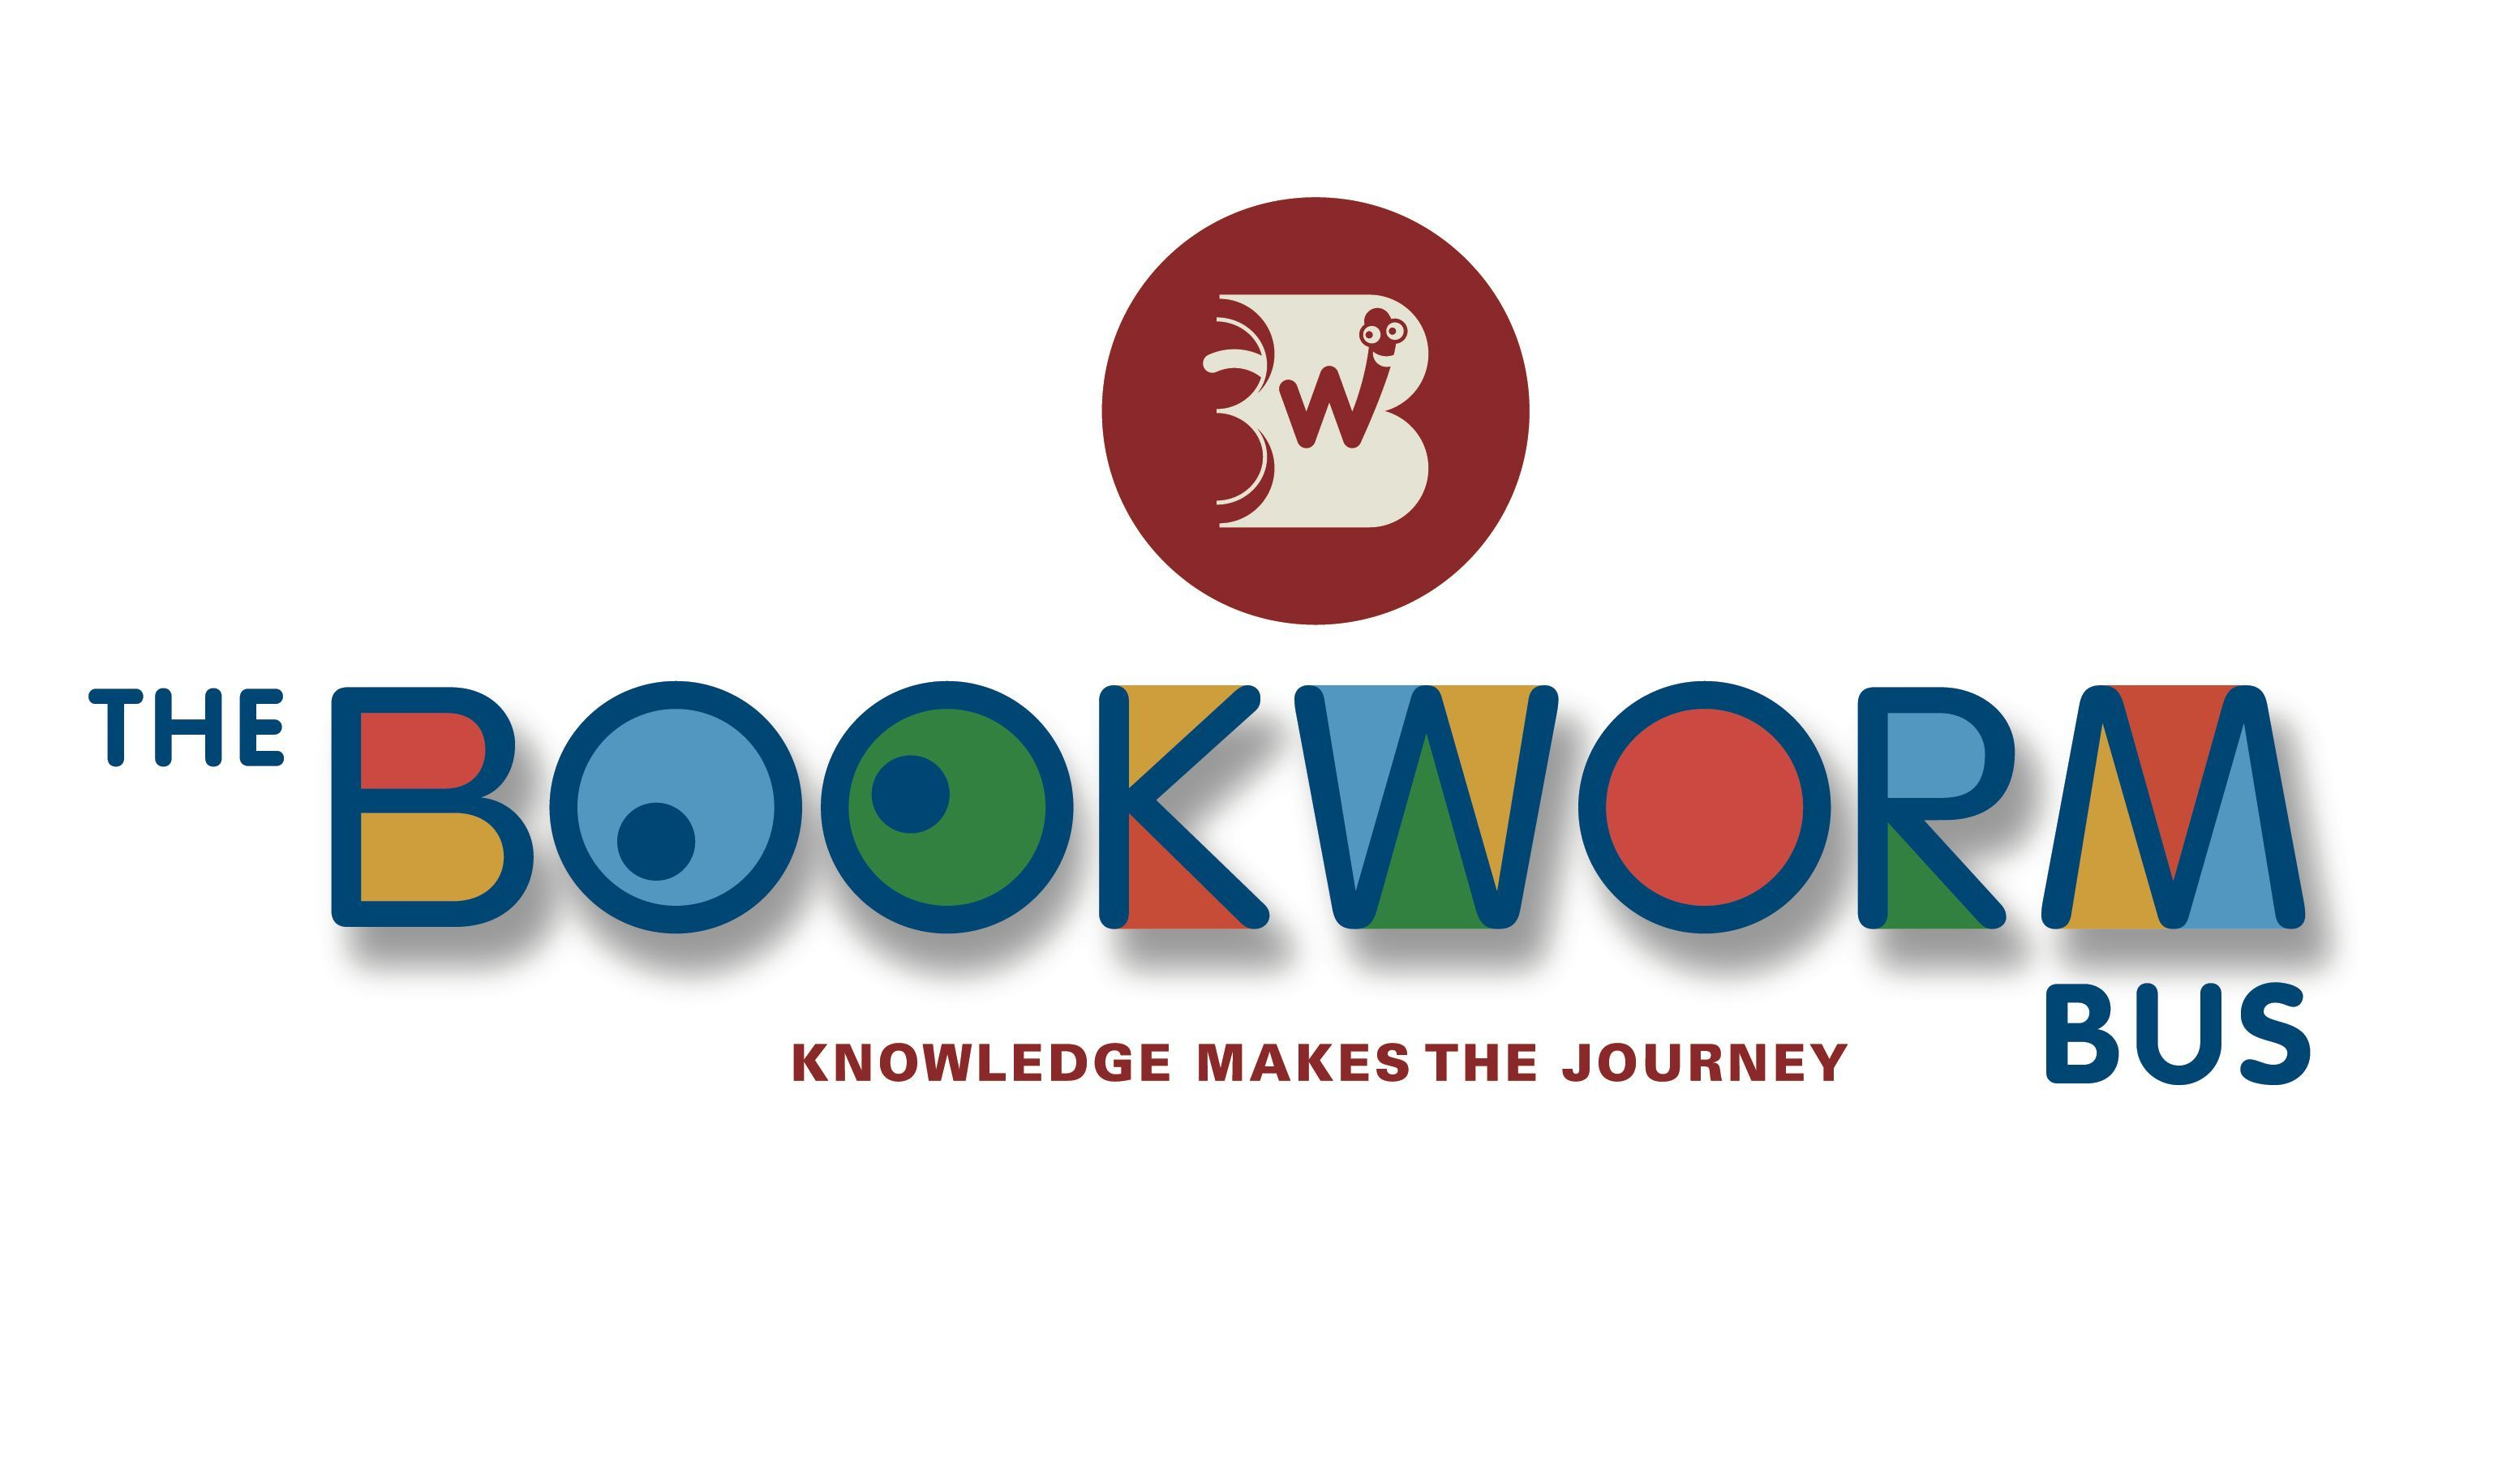 Bookworm Bus